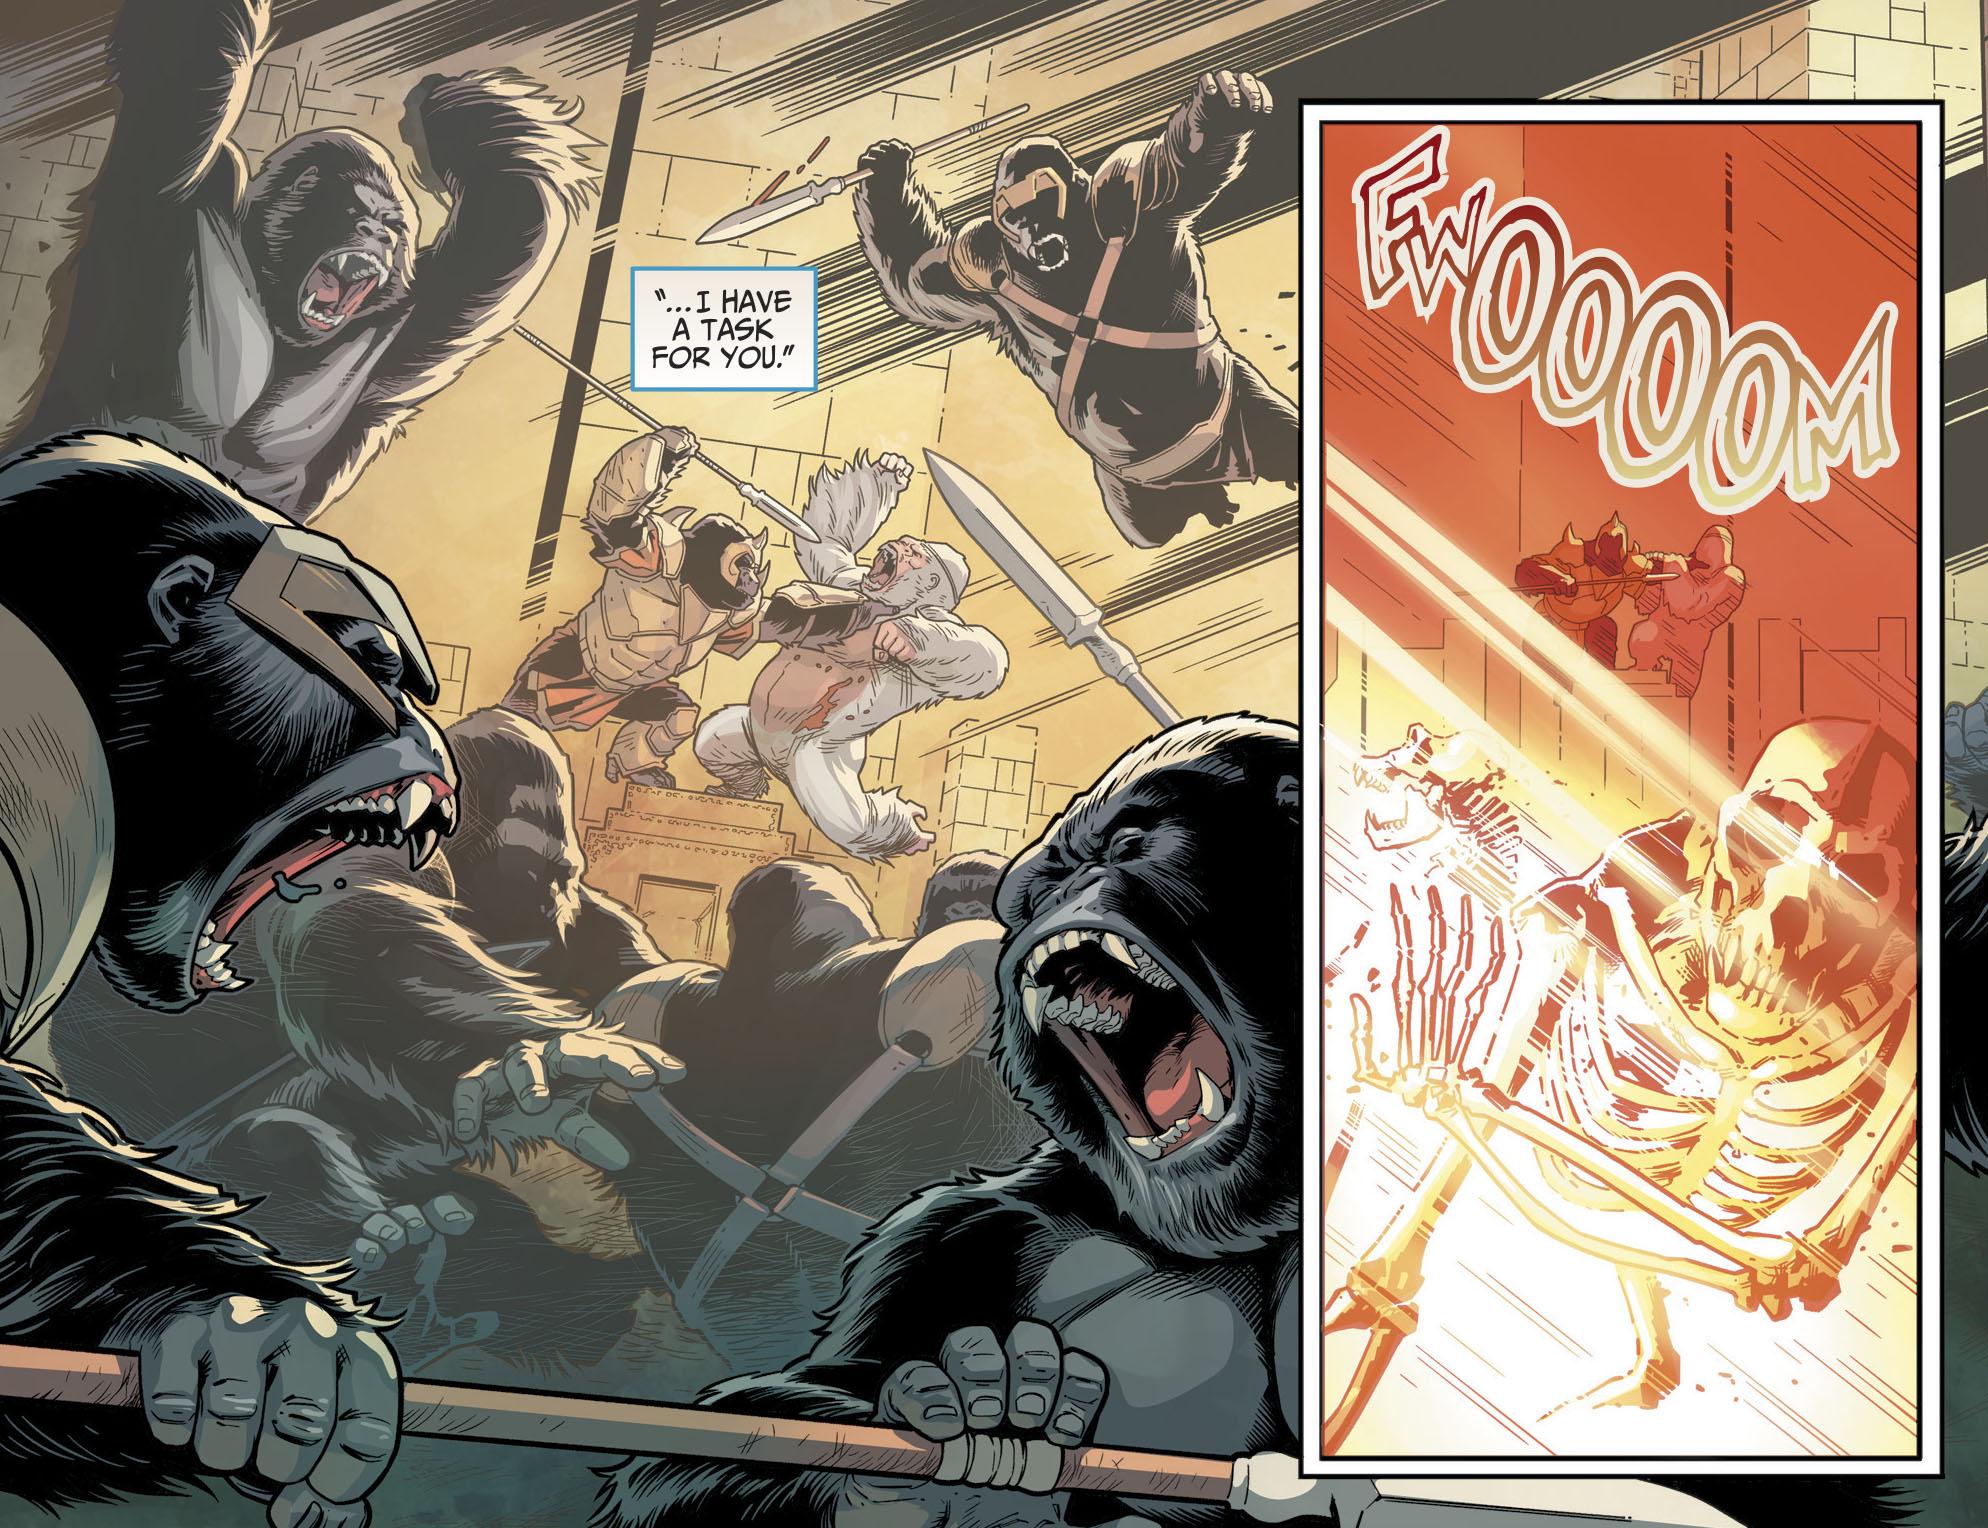 Amazo VS Gorilla Grodd (Injustice II)